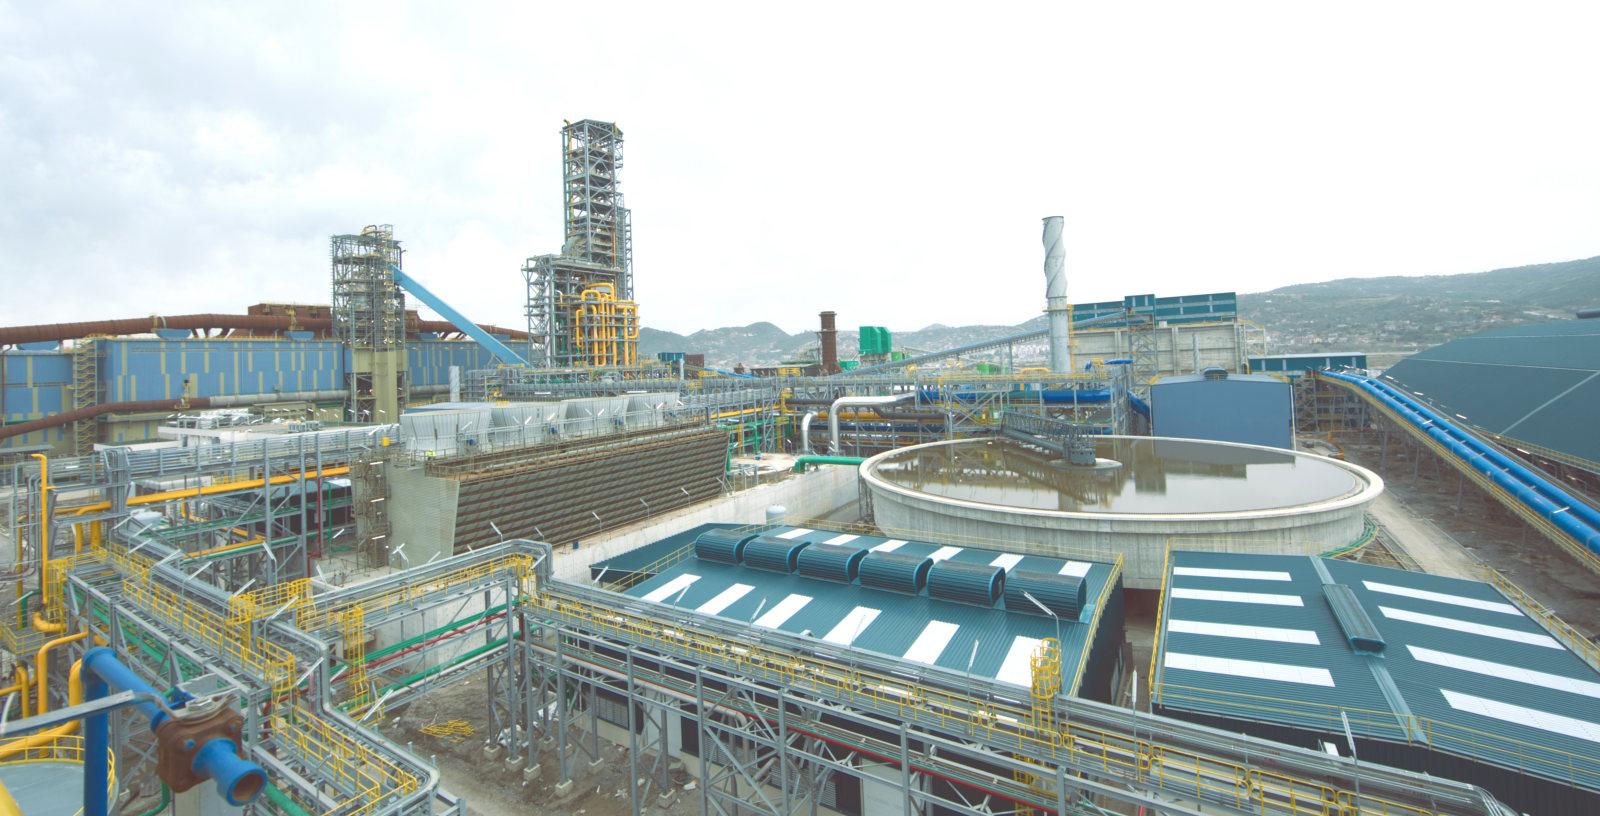 Integrated_Steel_Complex_Bellara_Algeria_AQS_IDOM_003